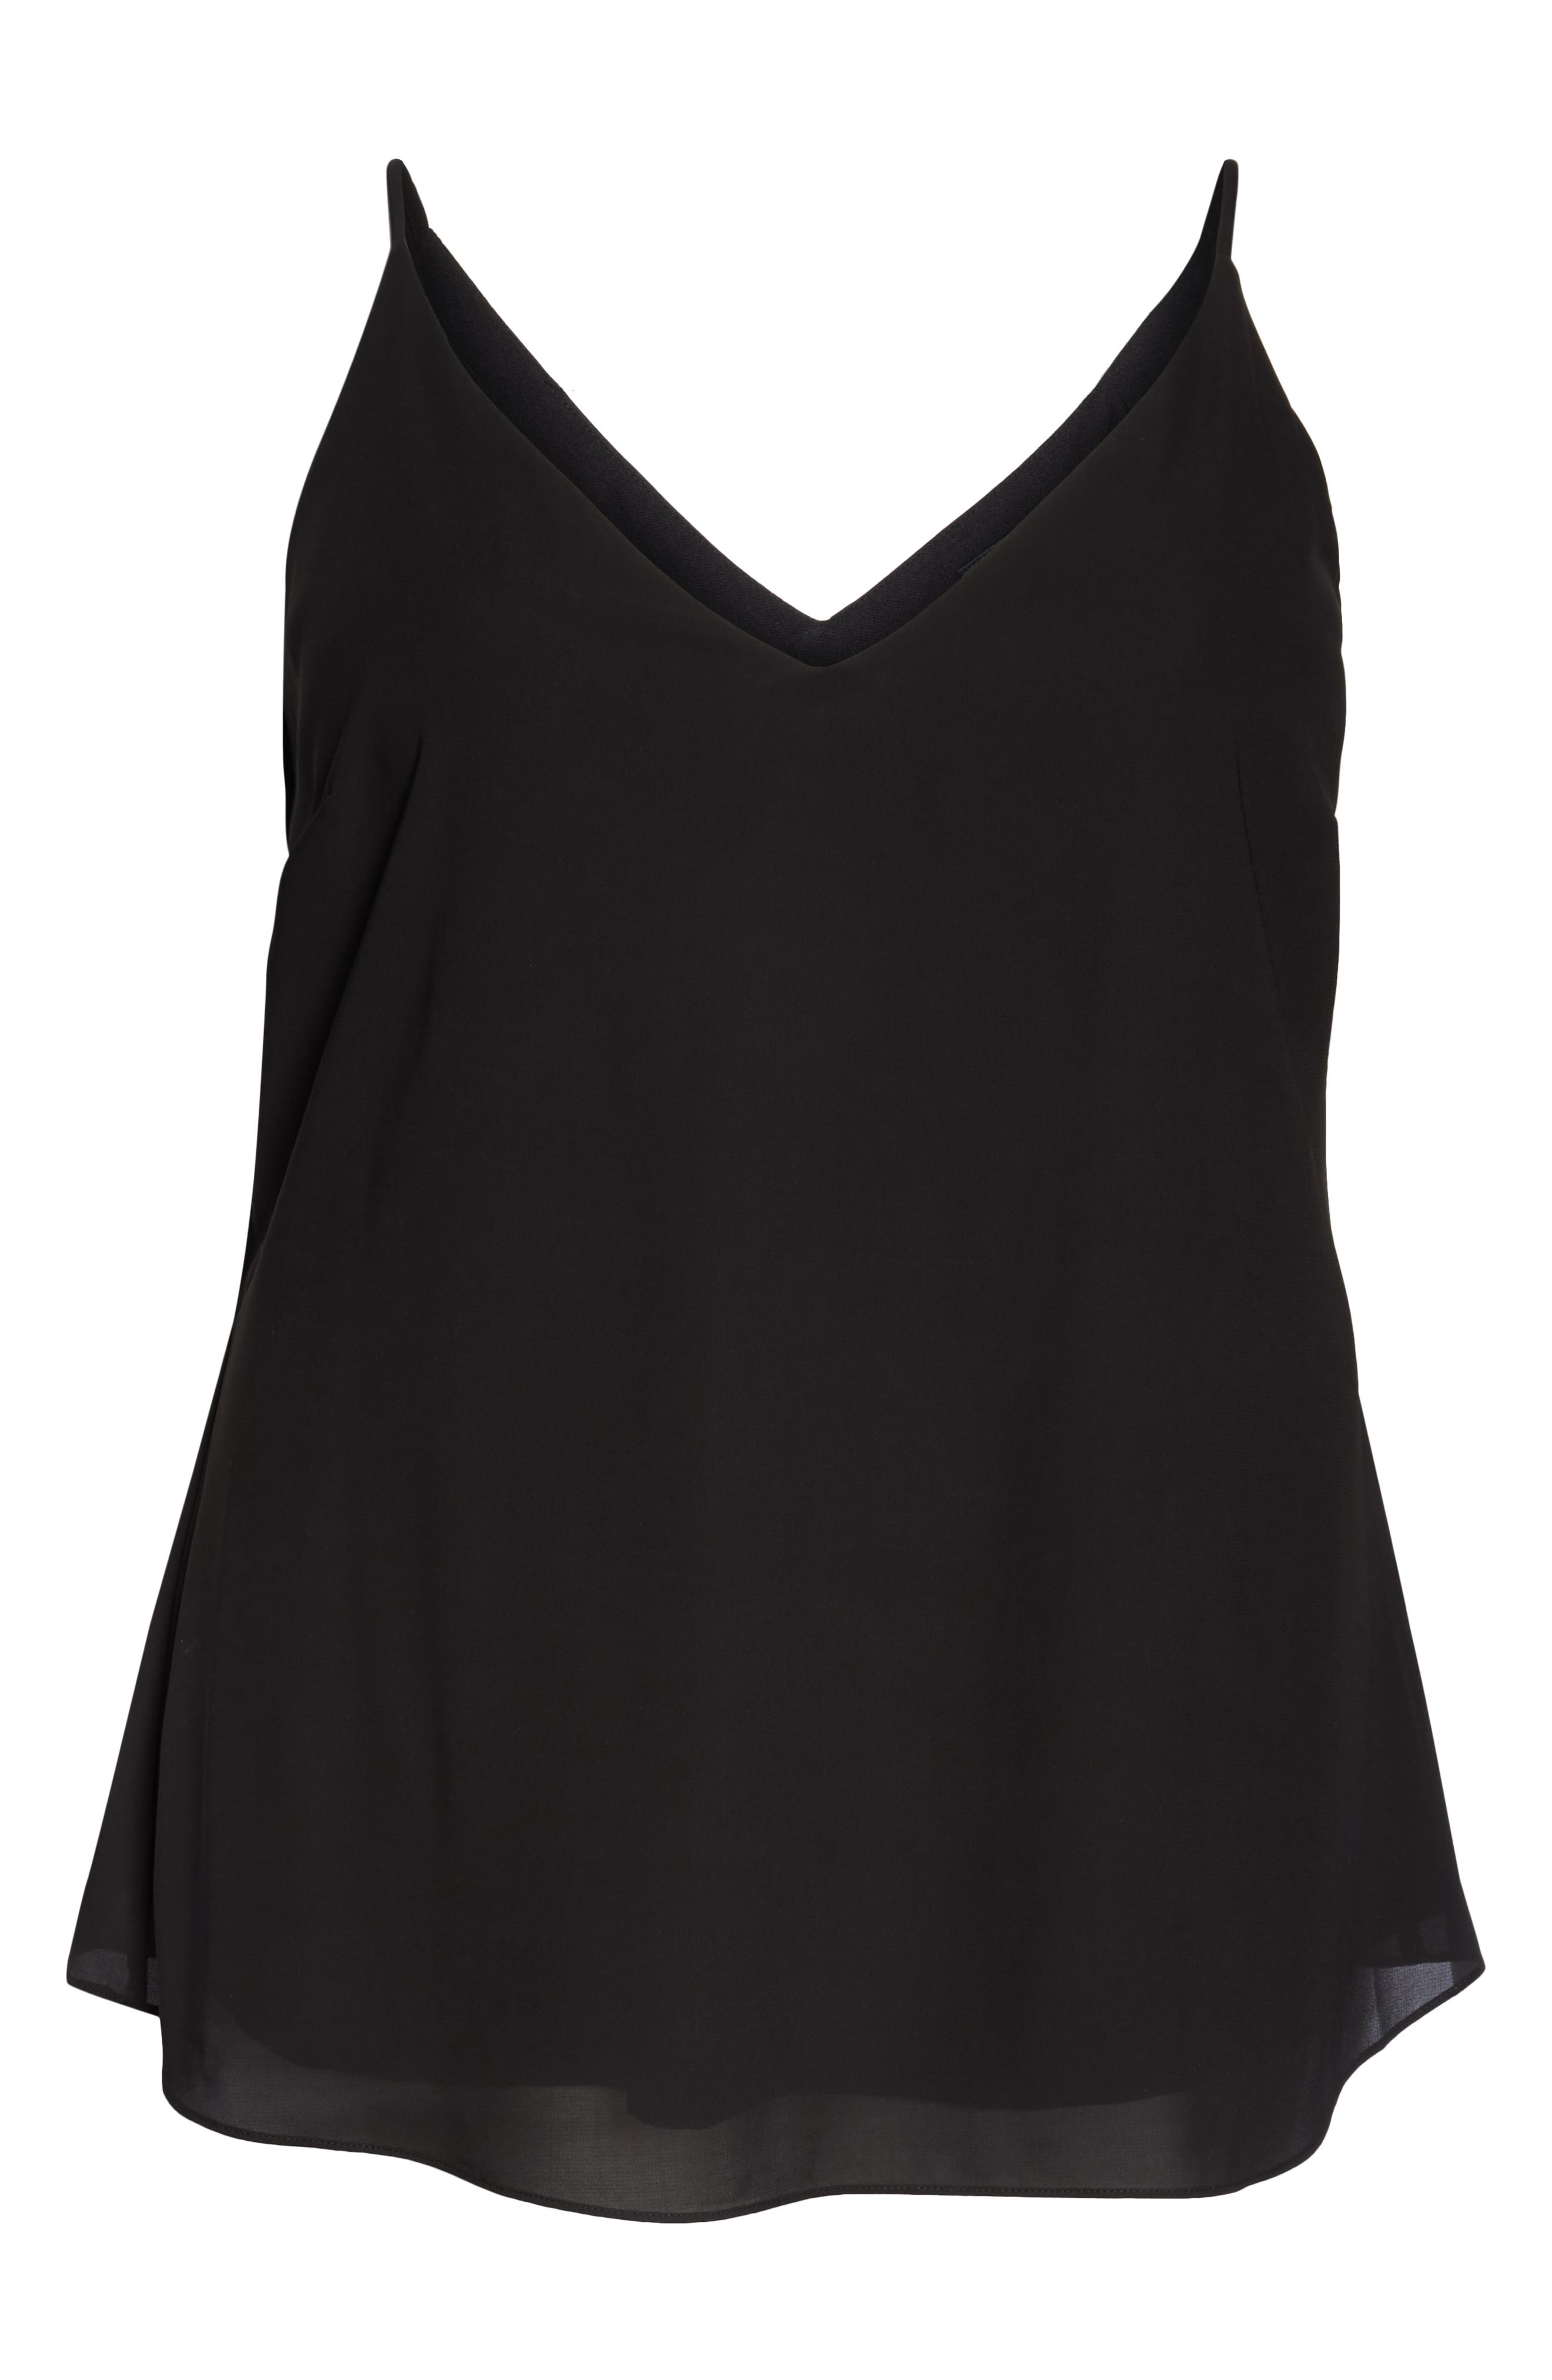 Double Layer V-Neck Camisole Top,                             Alternate thumbnail 2, color,                             BLACK